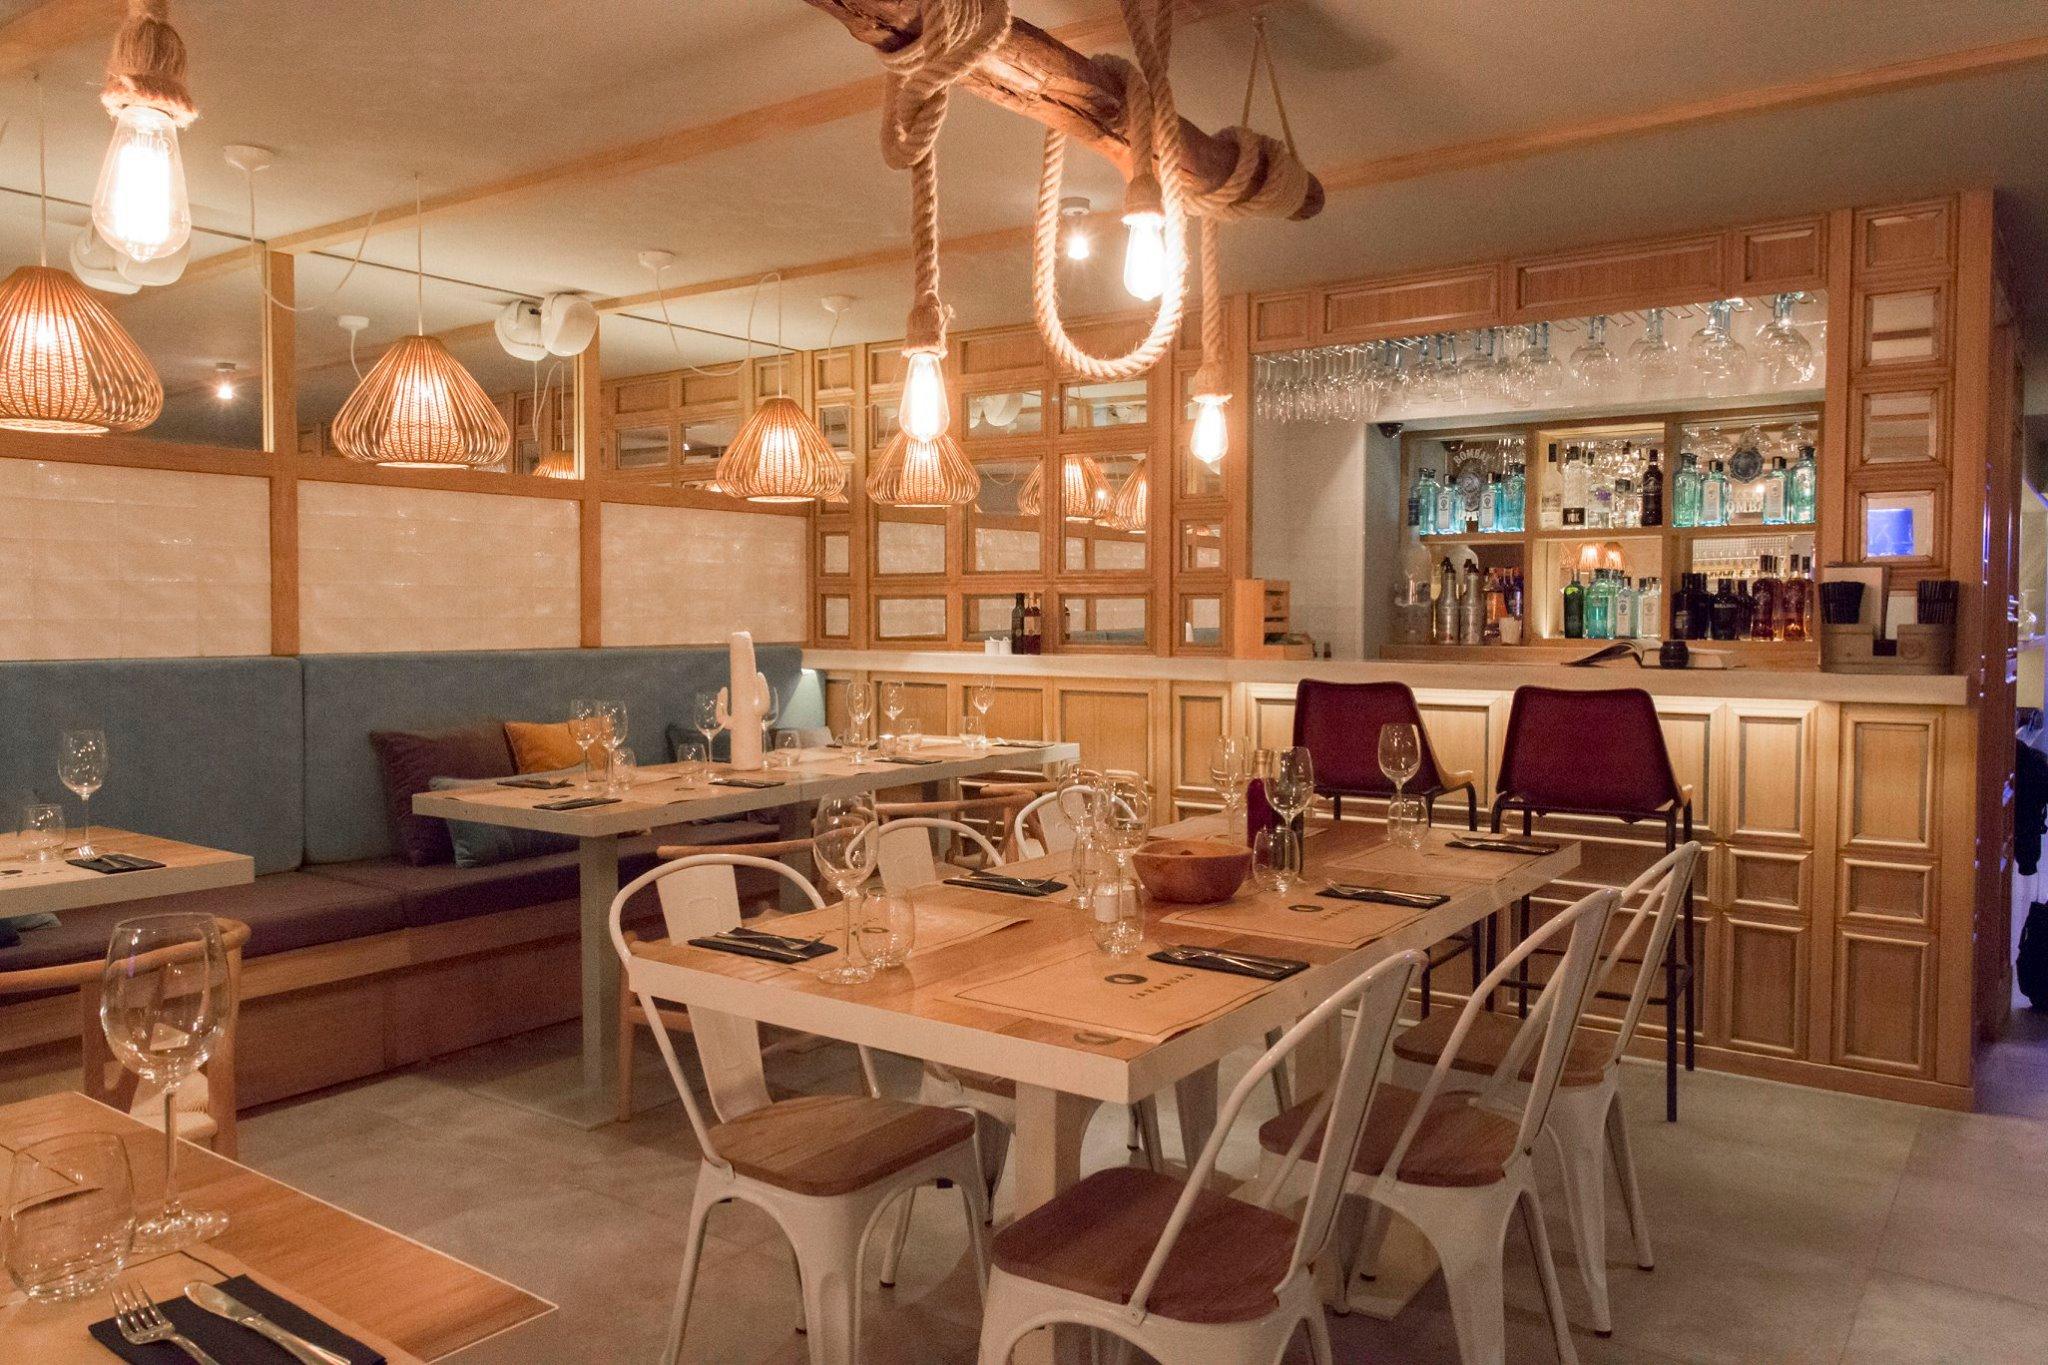 Restaurantes rom nticos en barcelona para un san valent n - Restaurante semproniana barcelona ...